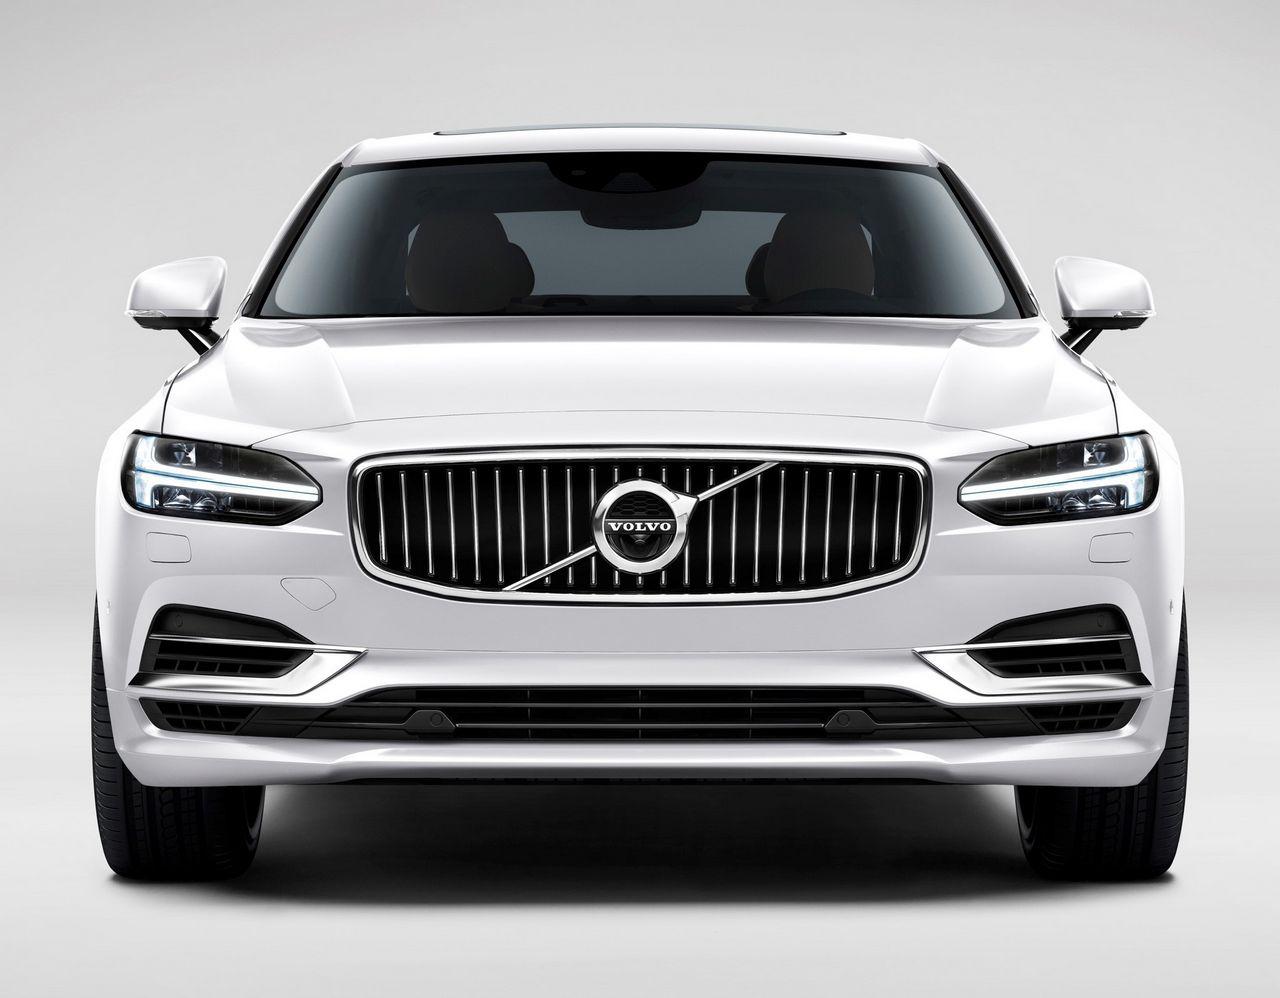 Front Volvo S90 White